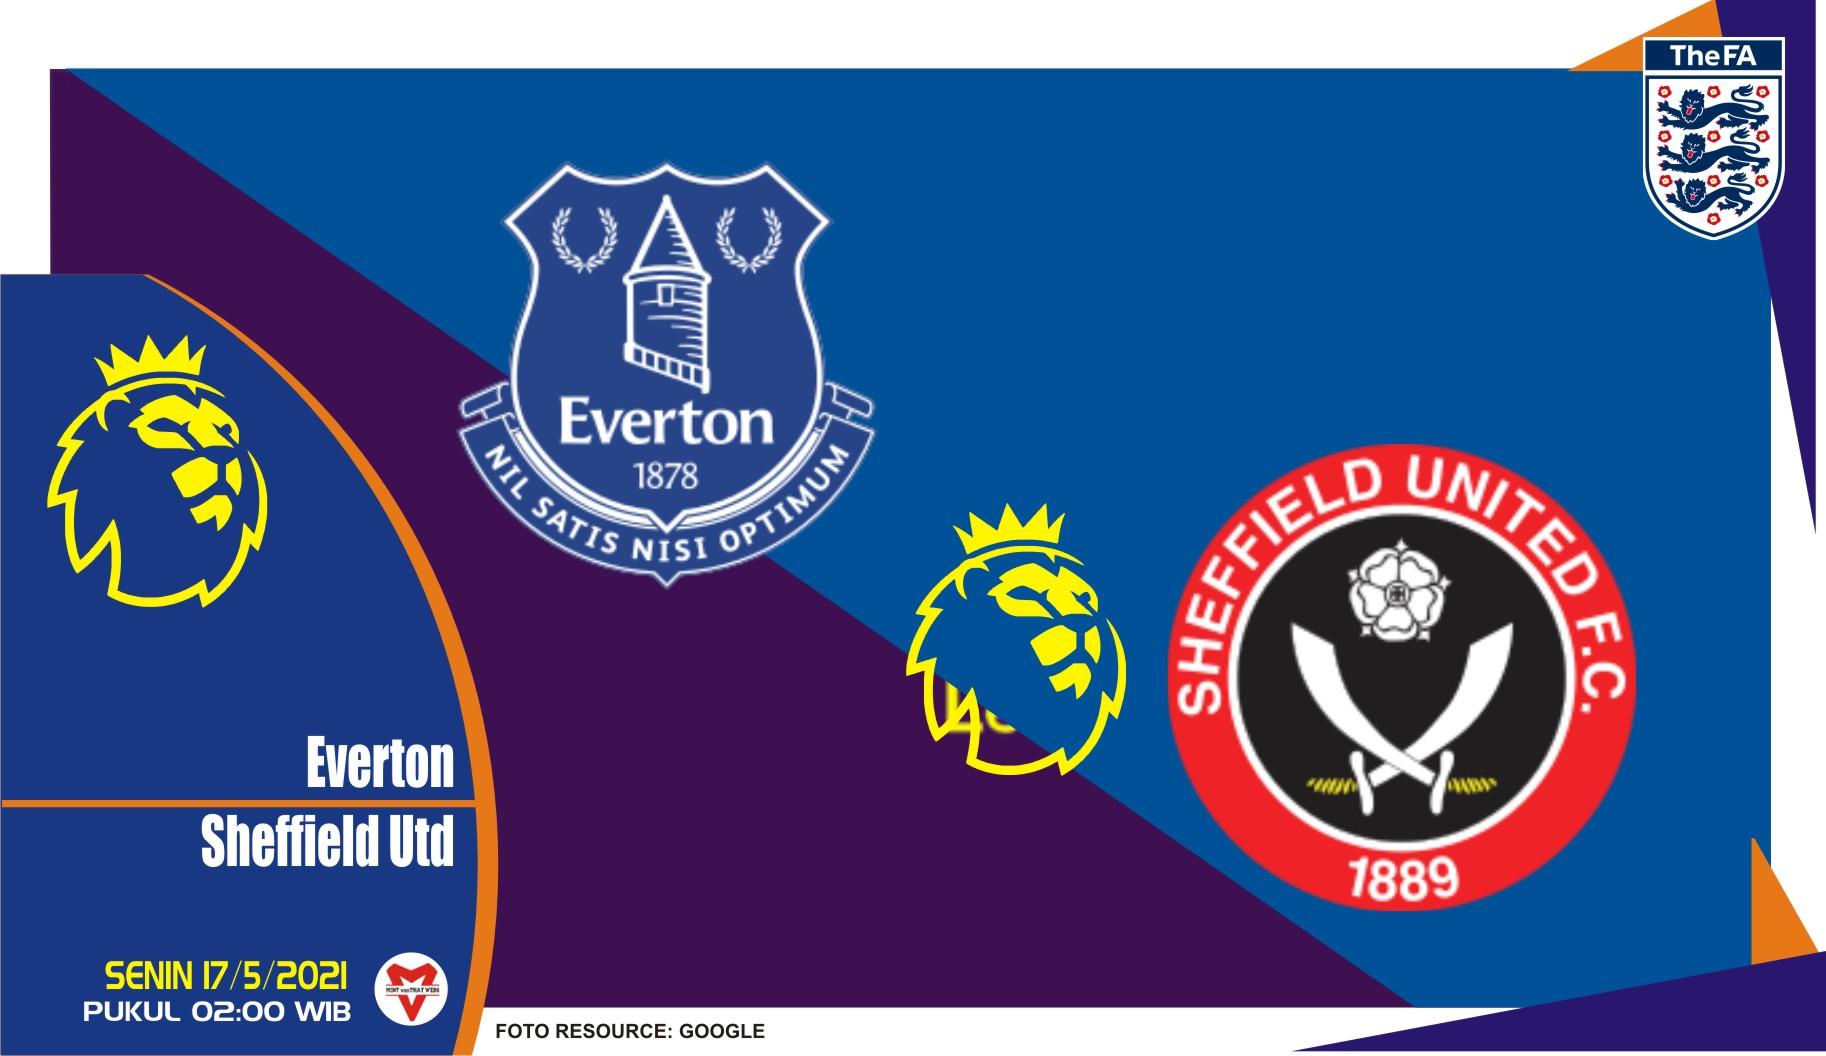 Prediksi Liga Inggris: Everton vs Sheffield United - 17 Mei 2021